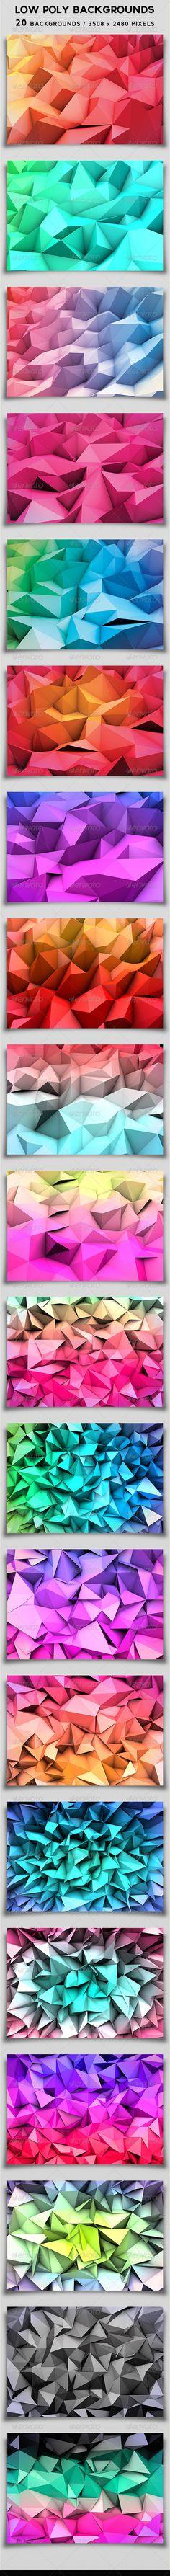 Low Poly Backgrounds by Darius Zan, via Behance Web Design, Design Art, Polygon Art, Design Graphique, Image Hd, Grafik Design, Low Poly, Geometric Art, Graphic Design Inspiration